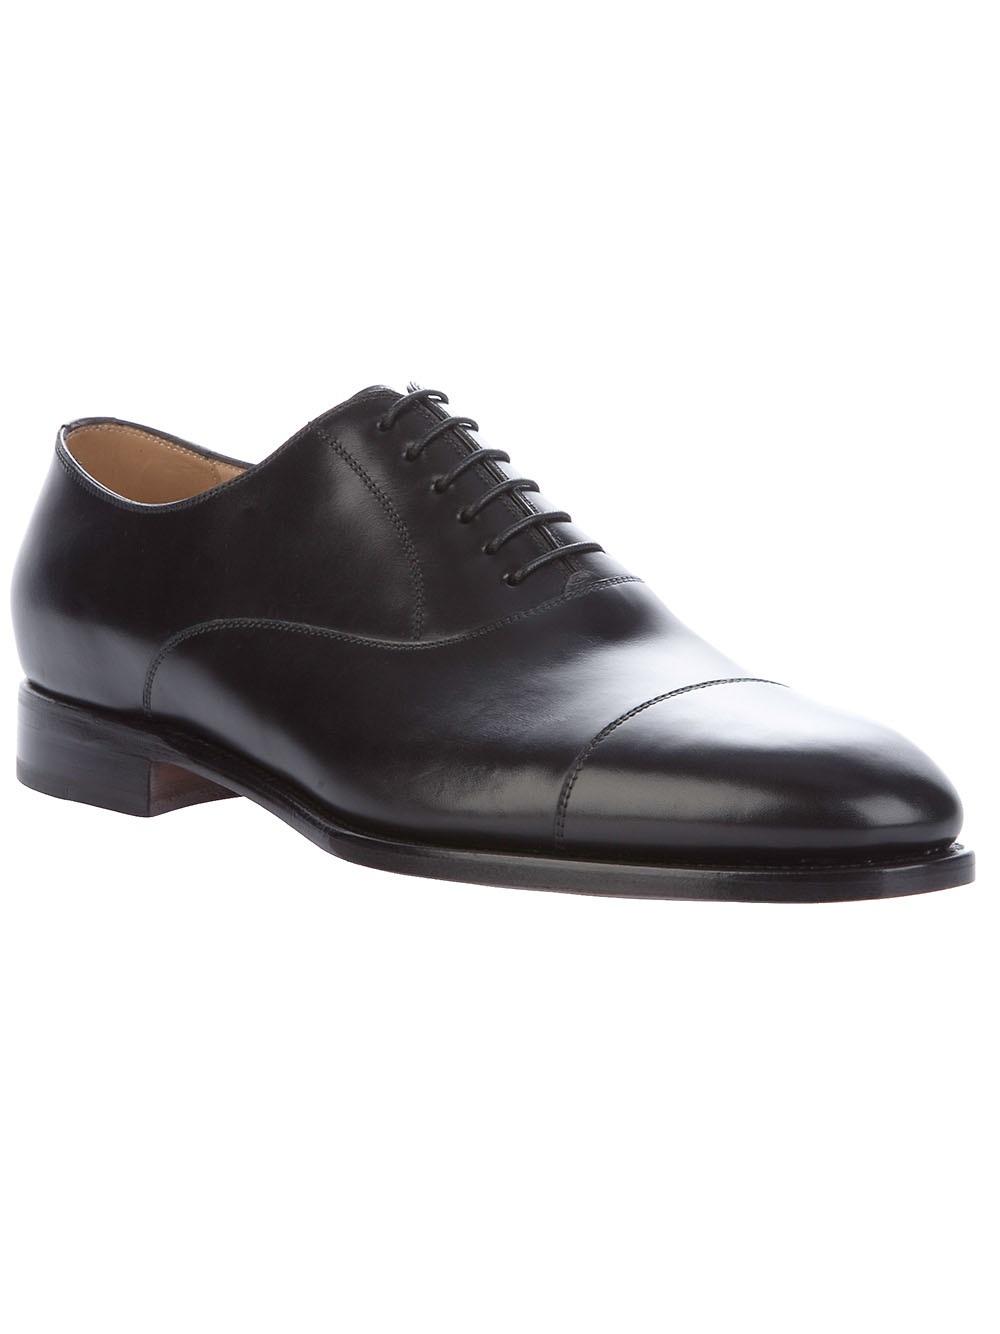 FOOTWEAR - Lace-up shoes Kiton e947pJUd